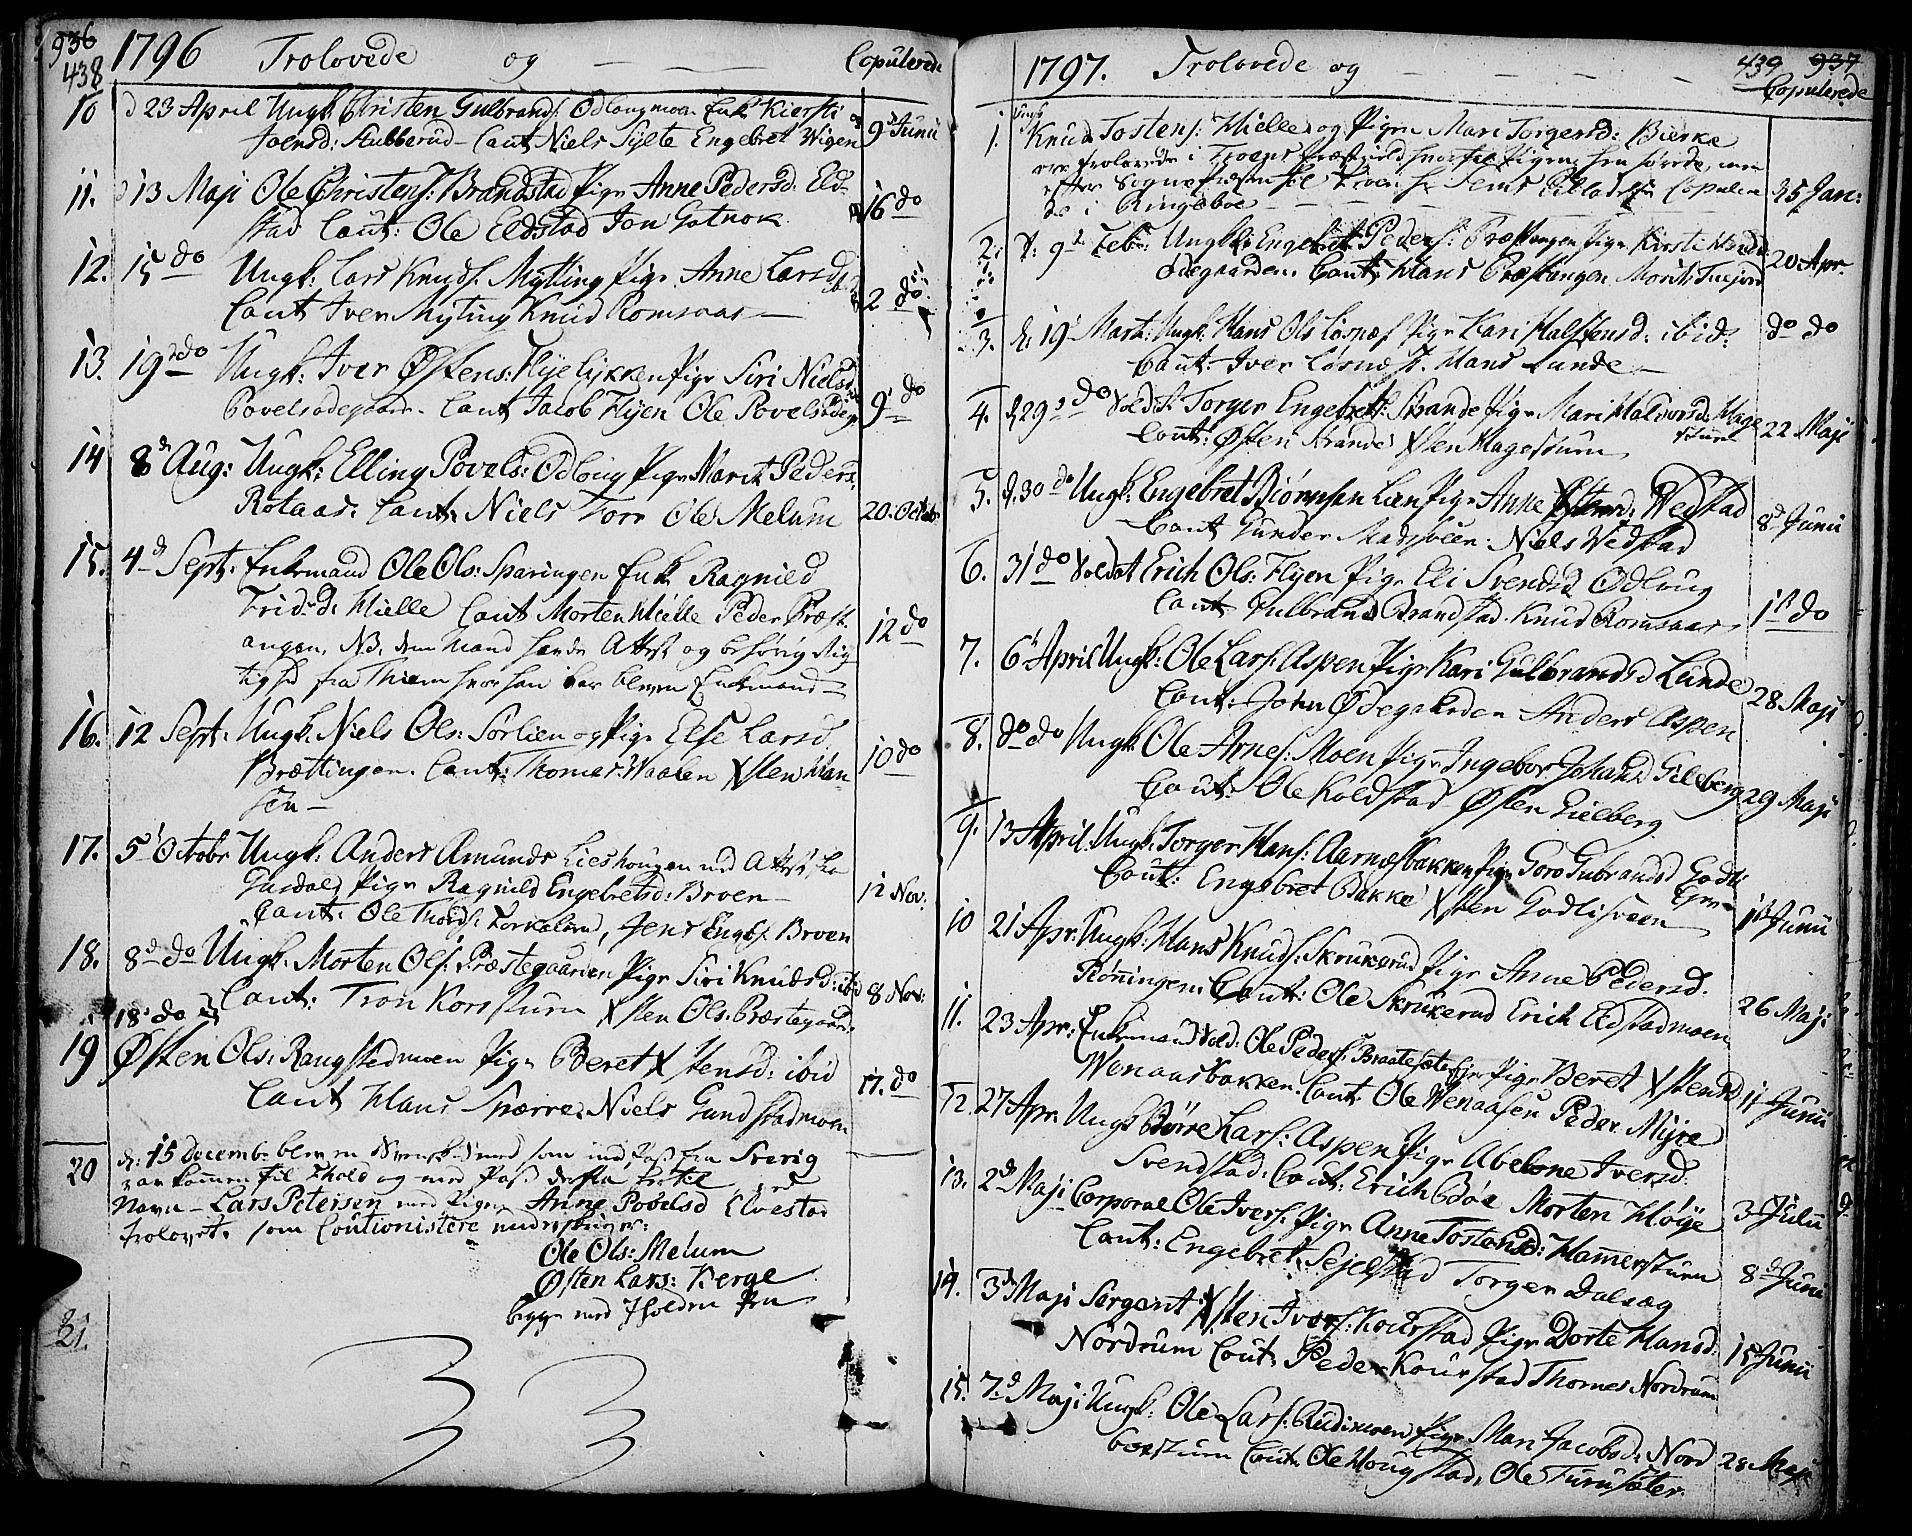 SAH, Ringebu prestekontor, Ministerialbok nr. 3, 1781-1820, s. 438-439